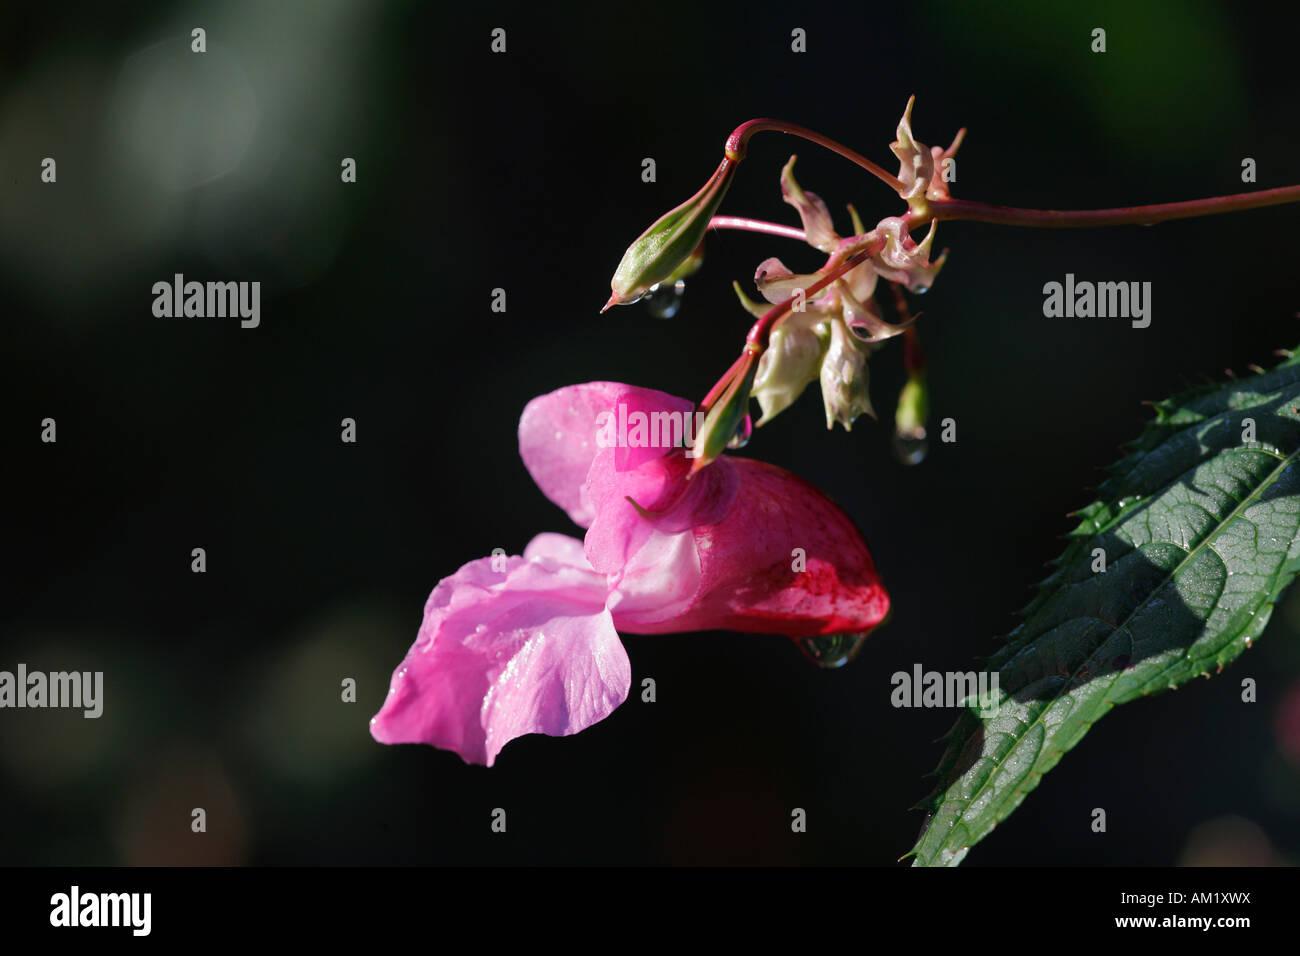 Indian Balsam, ornamental jewelweed ( Impatiens glandulifera ) Stock Photo